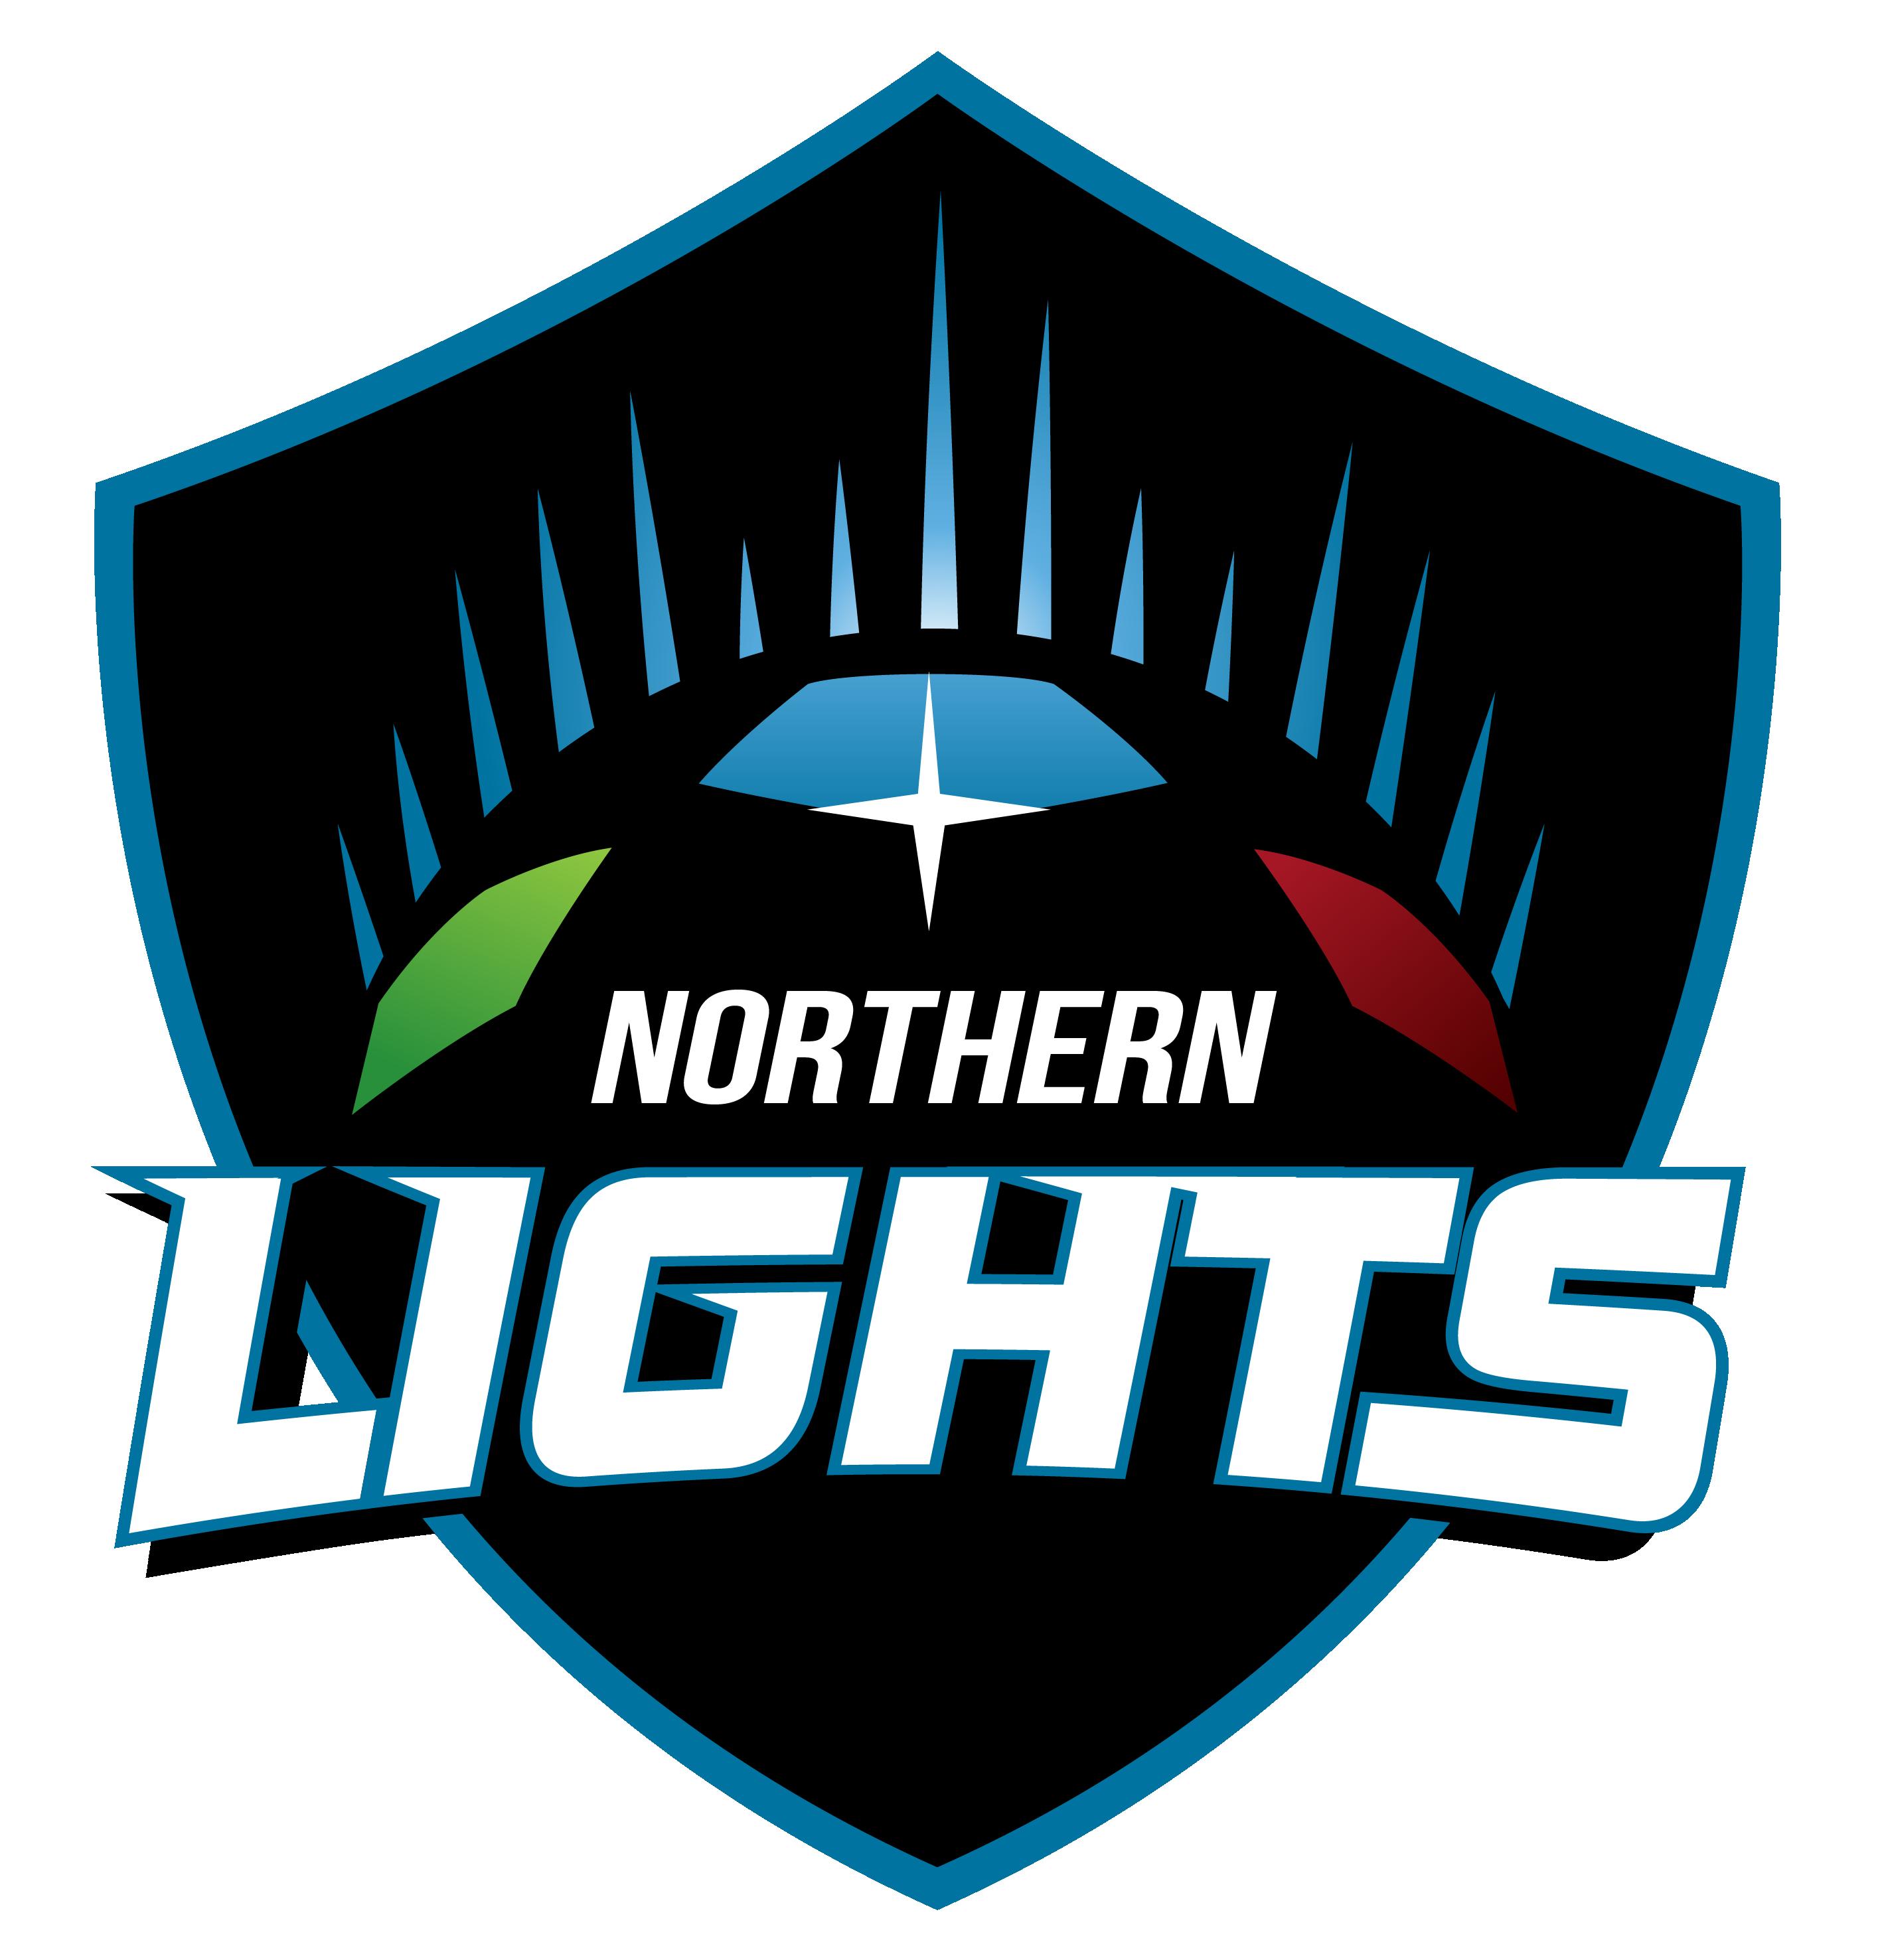 Logotipo da equipe do norte (feminino)